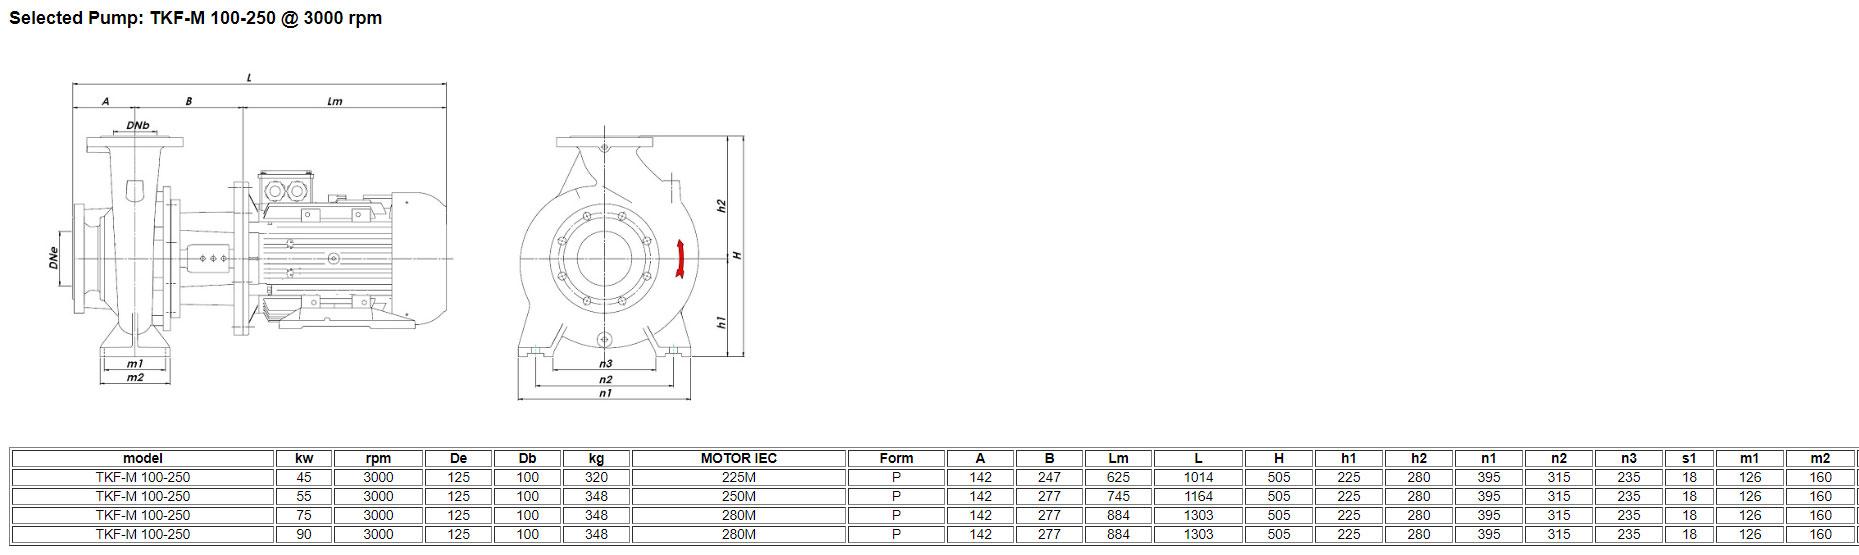 Kích thướcmáy bơm ly tâm đa tầng Sempa TKF-M 100-250